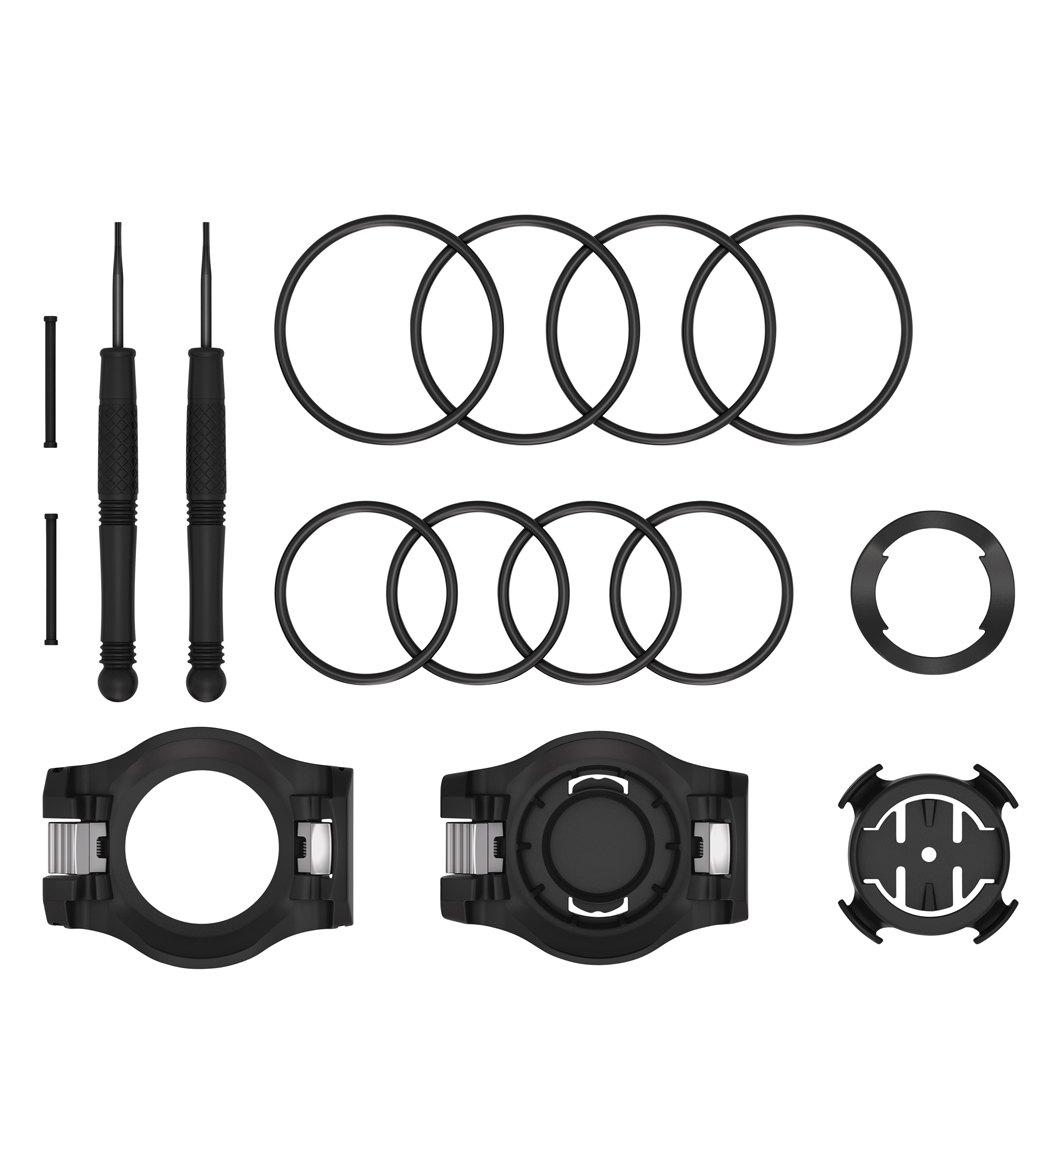 Garmin Quick Release Kit Black For Forerunner 935 Bike Wrist Mount Included At